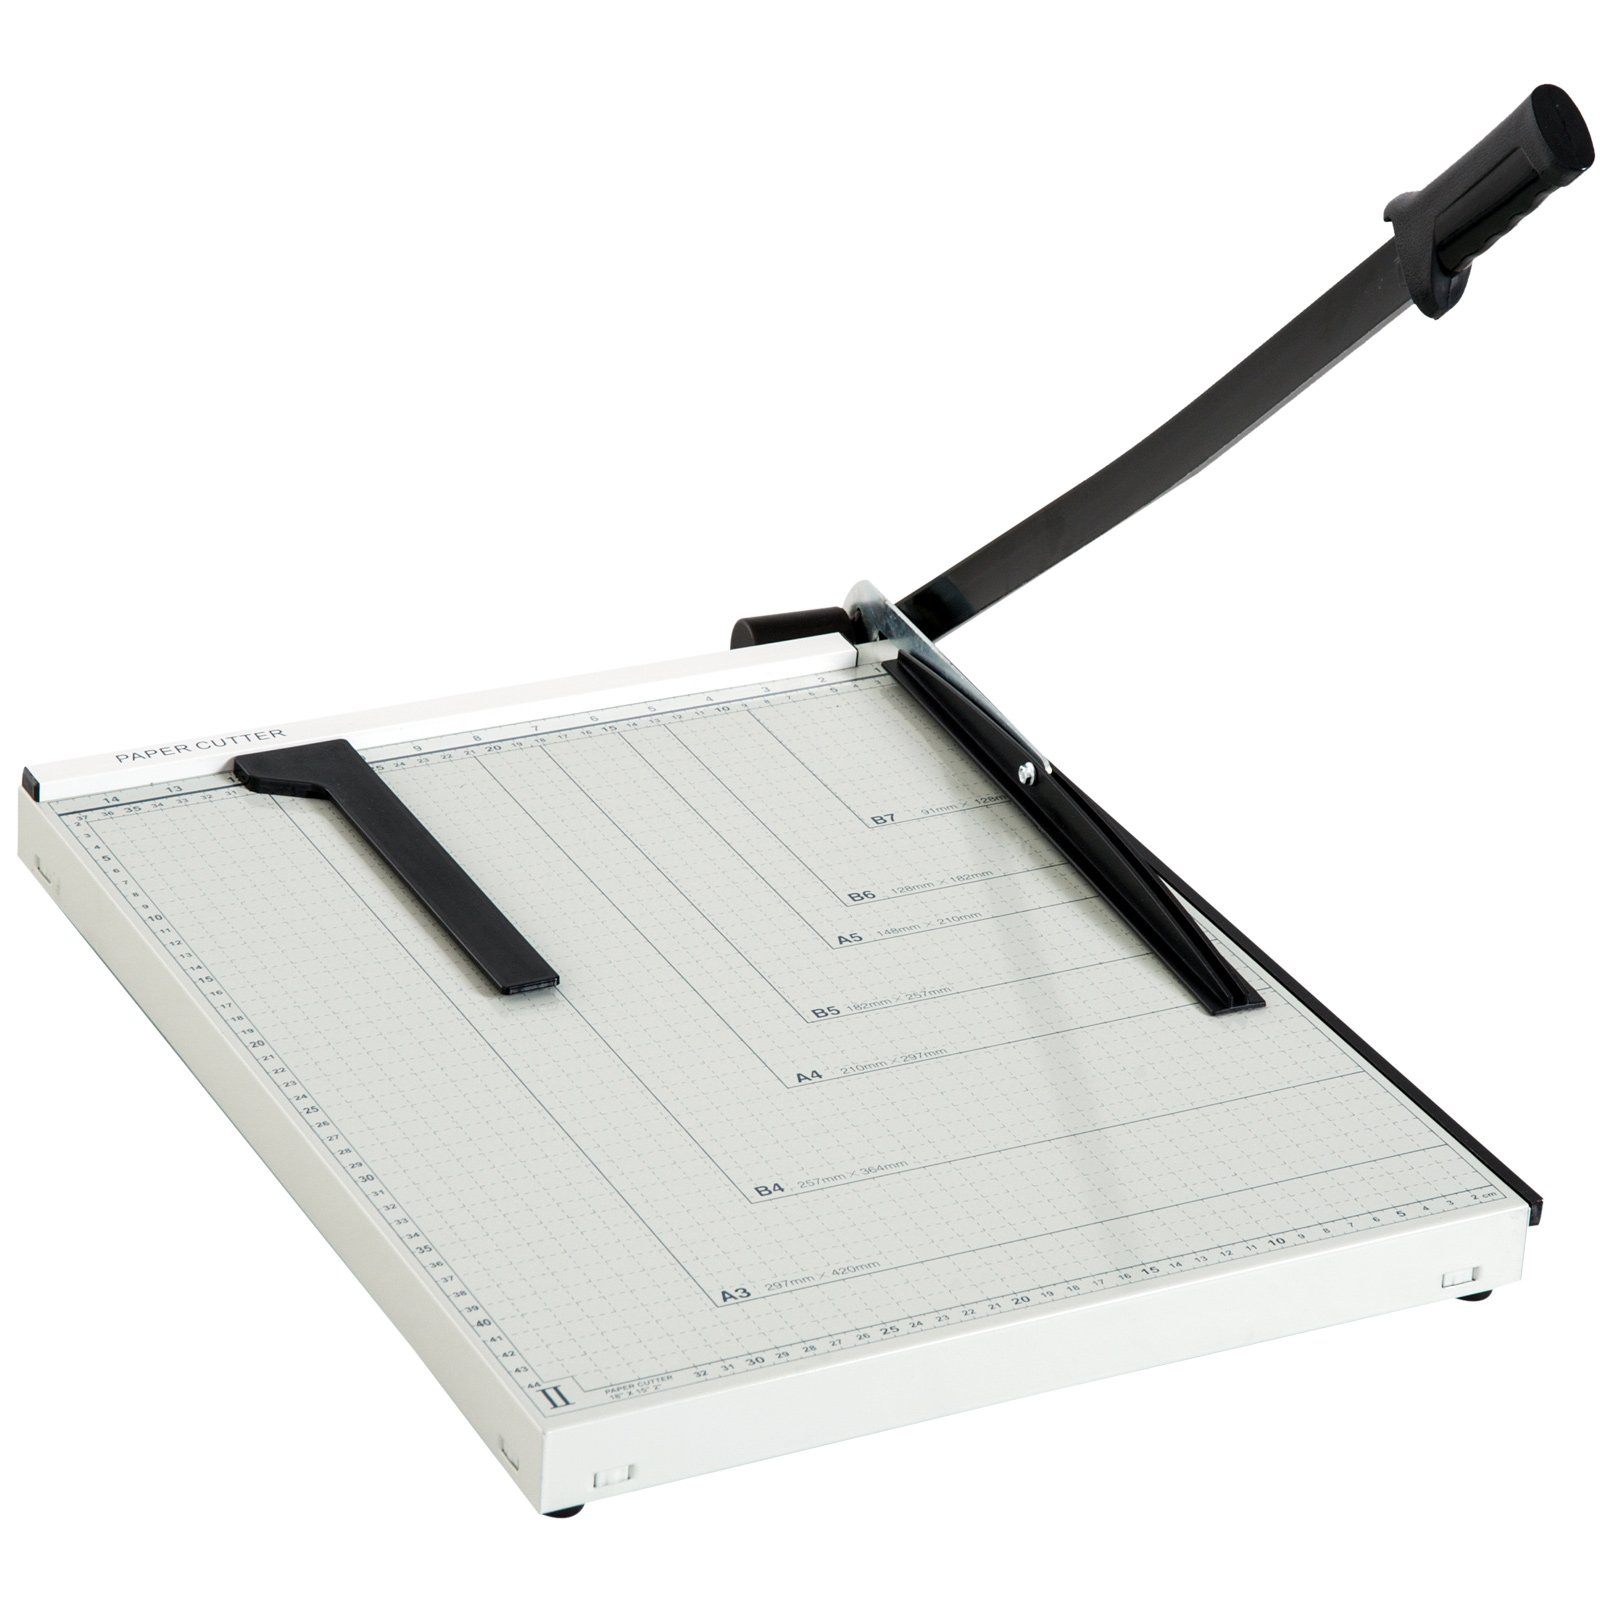 Paper Trimmer Cutter 18'' Cut Length, 12-Sheet Capacity Guillotine Paper Cutter MDF - White/Black